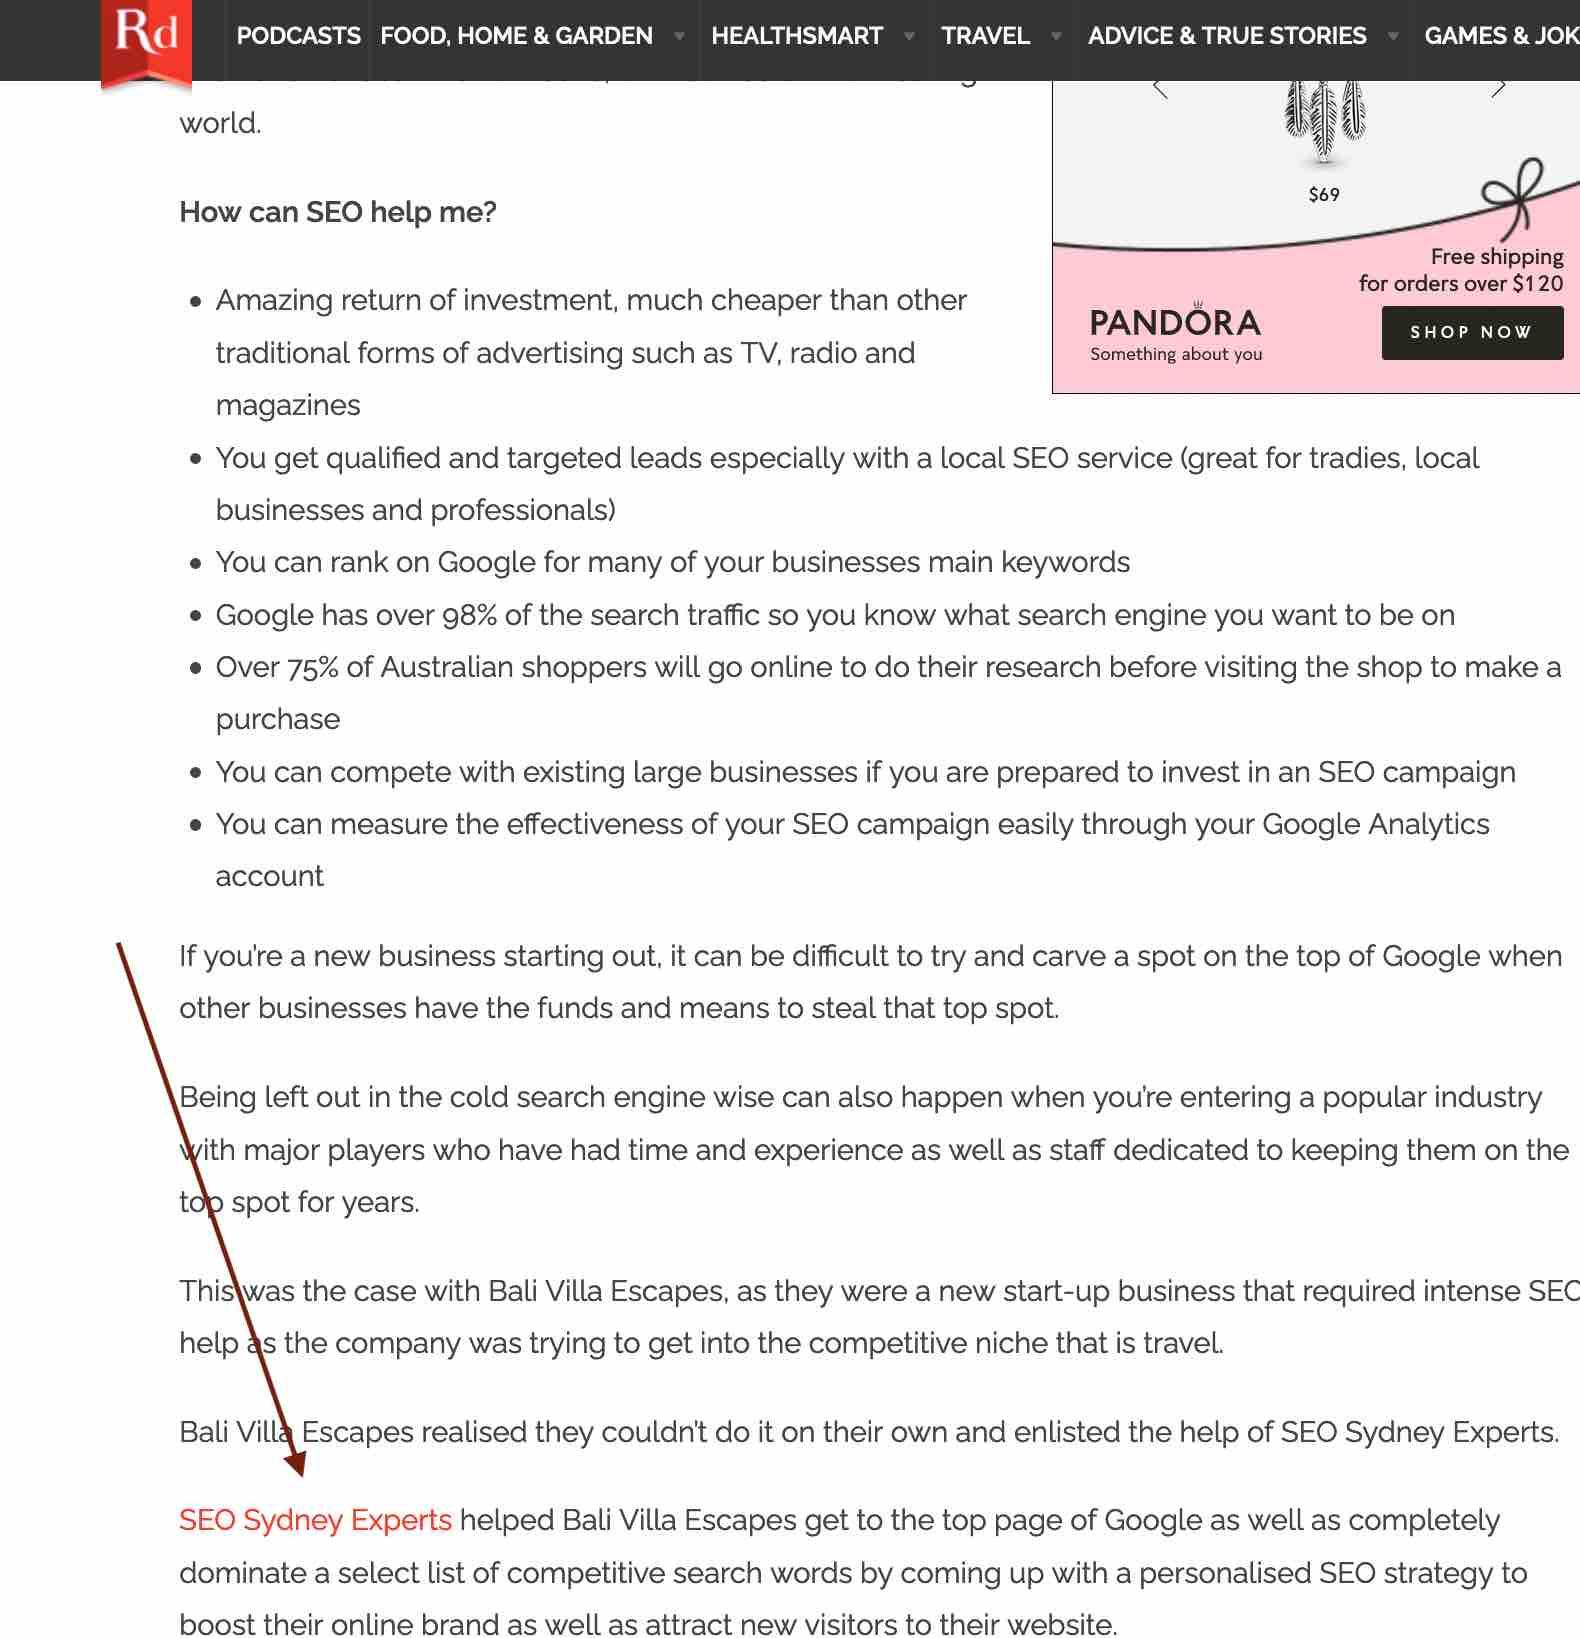 example of backlink - seo sydney experts